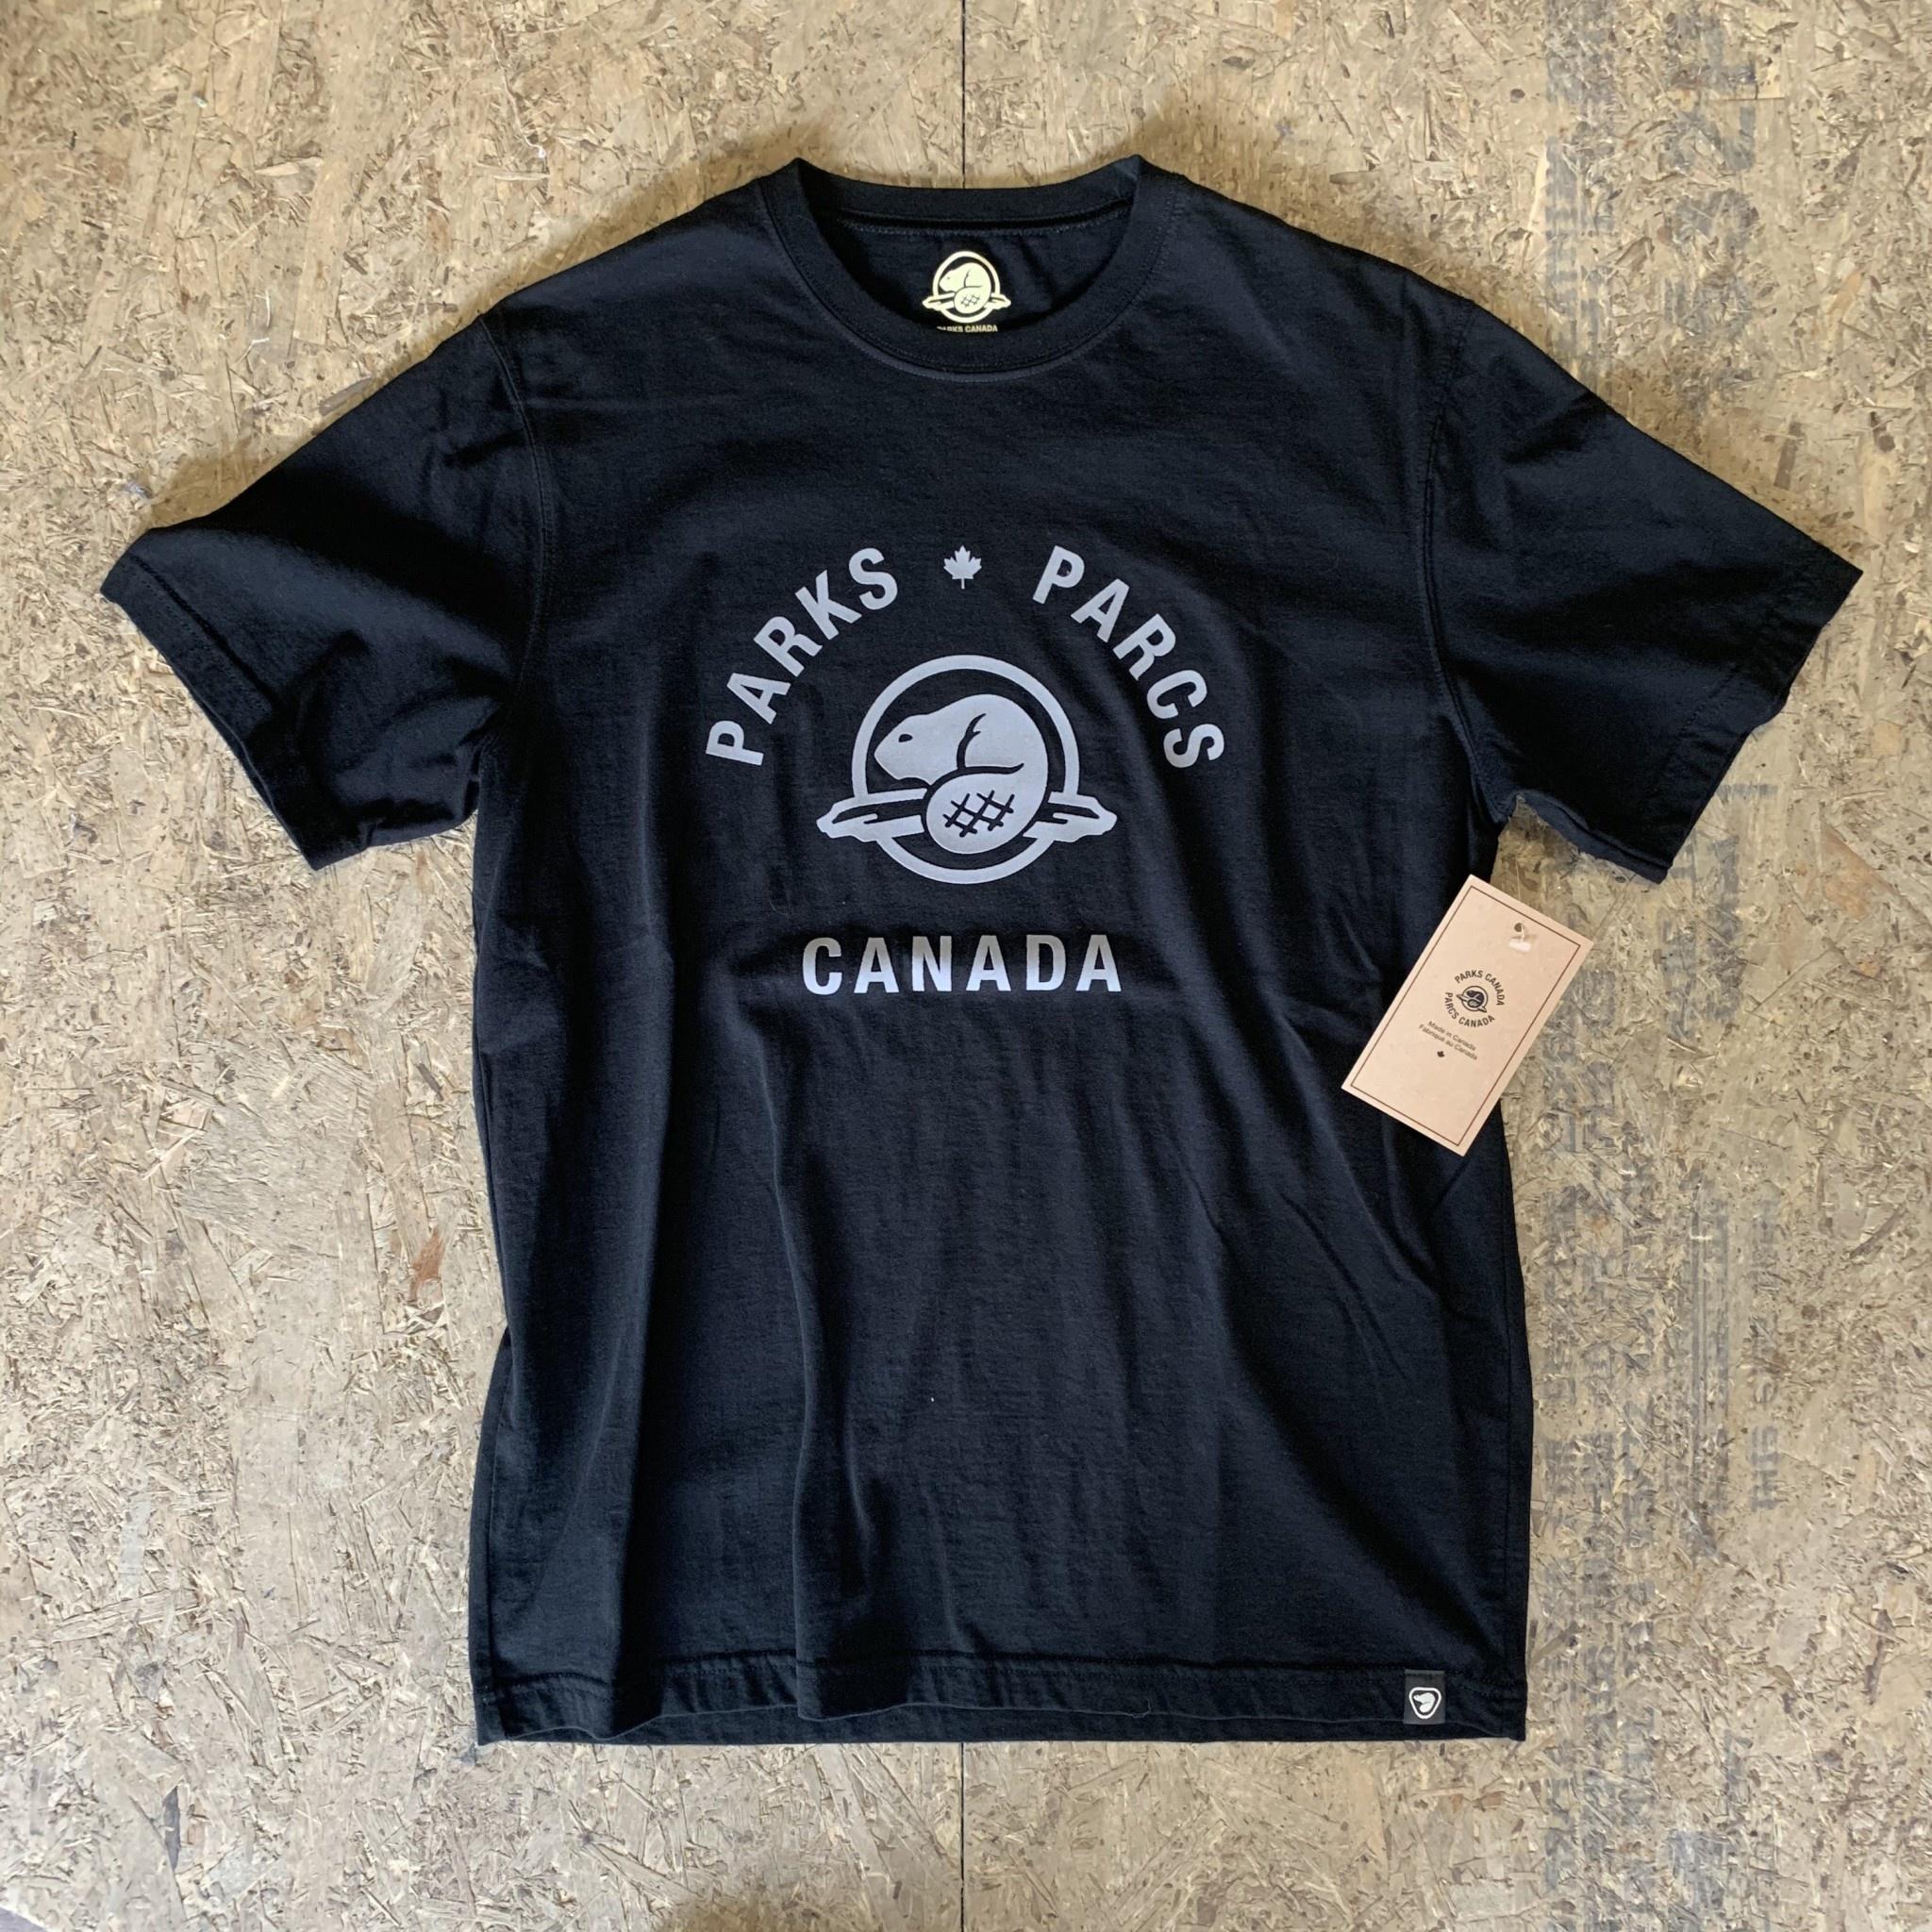 Parks Canada ParksCanada - Essential Tee - Blk - XL